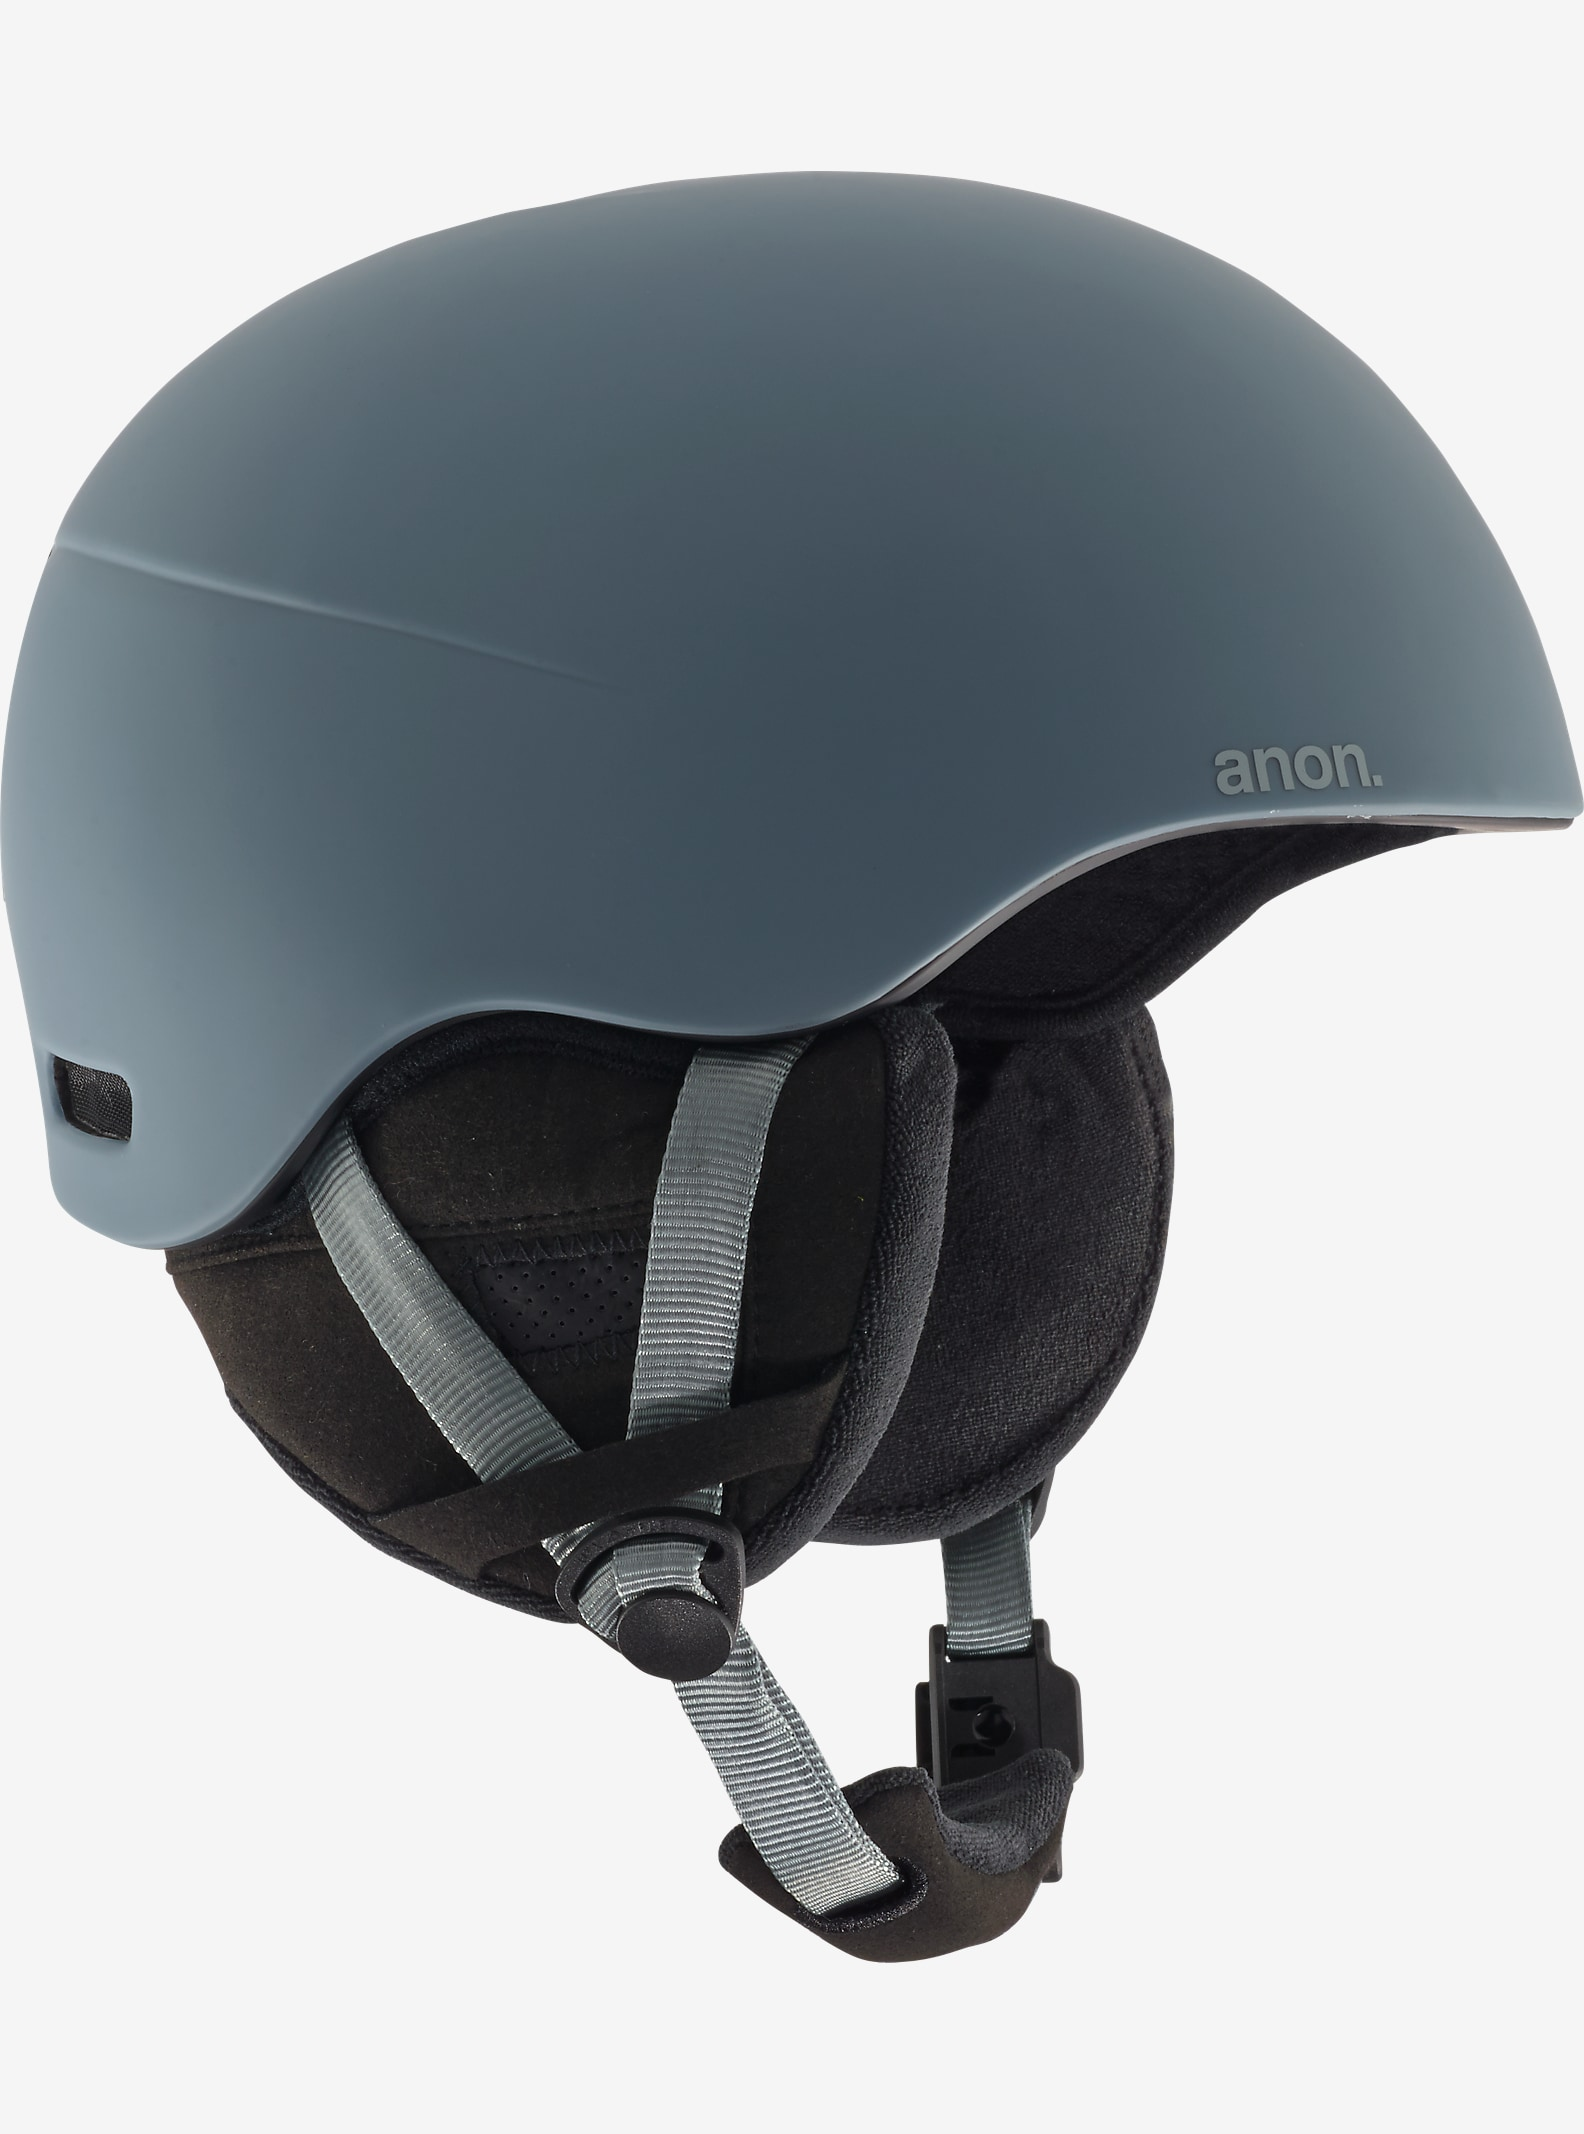 anon. Helo 2.0 Helmet shown in Dark Gray